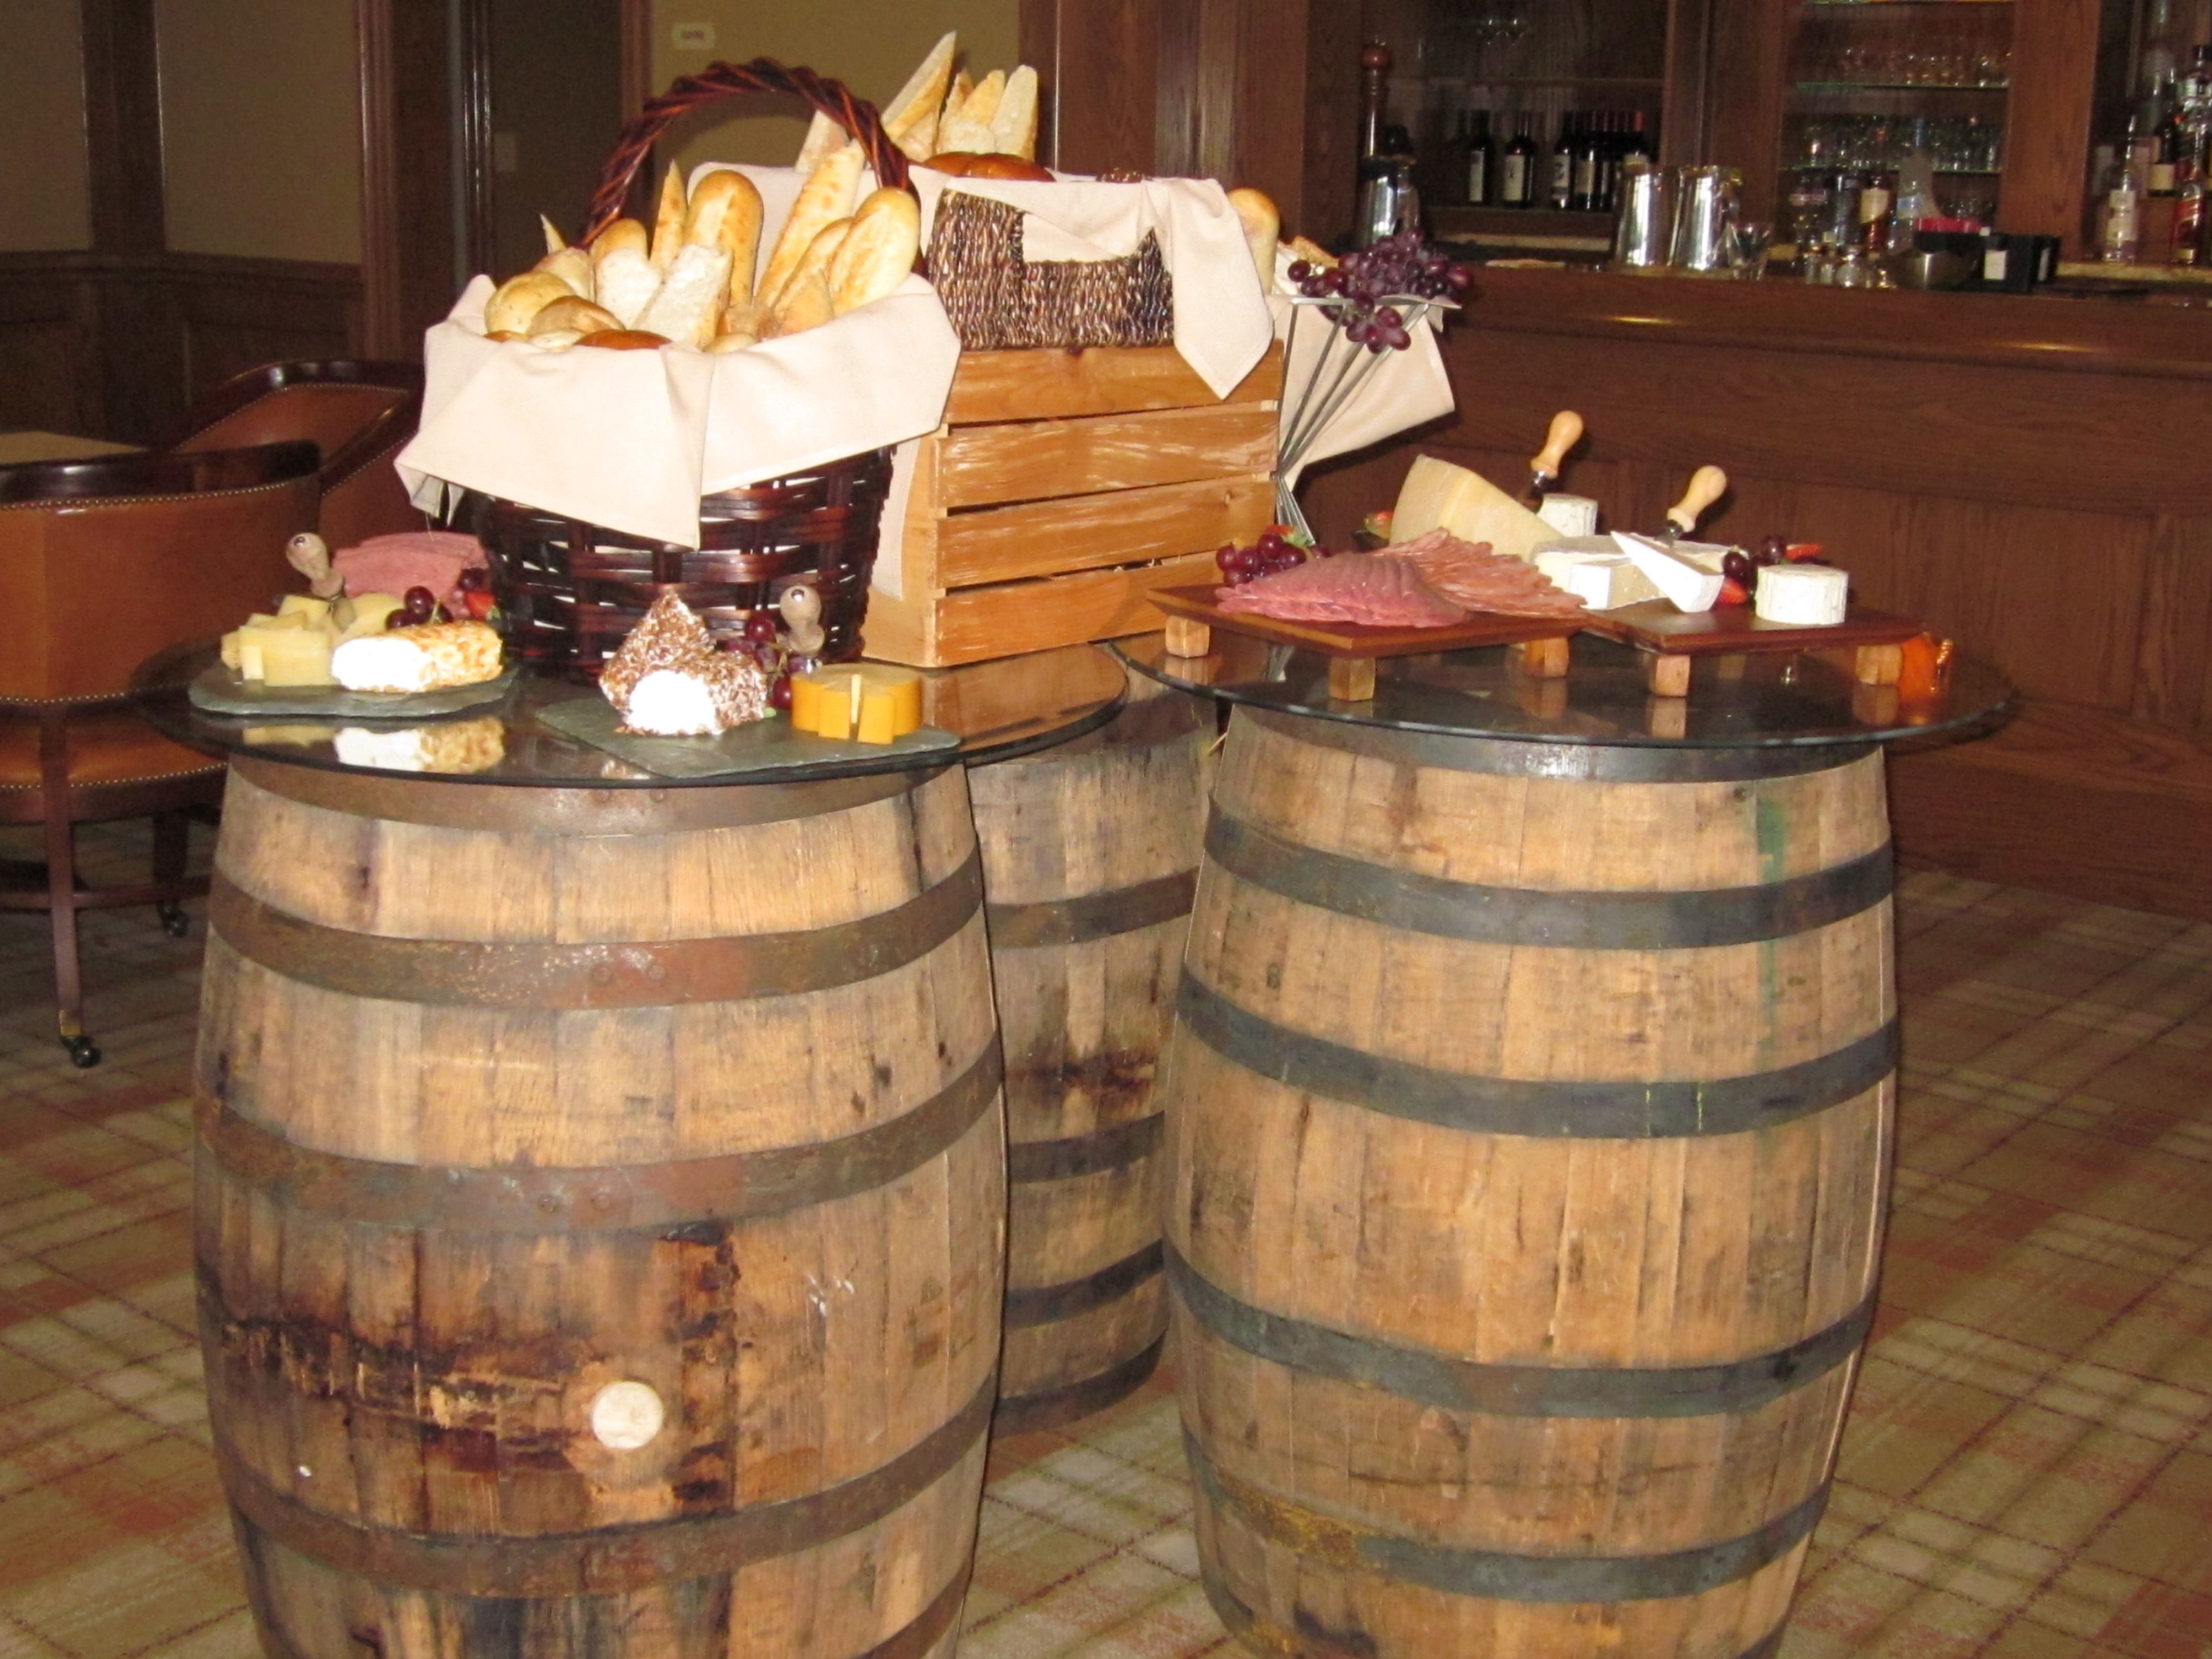 More Jack Daniels Wiskey Barrel Ideas Www Mypurelydecor Com Rustic Vintage Wedding Whiskey Barrel Table Bling Party